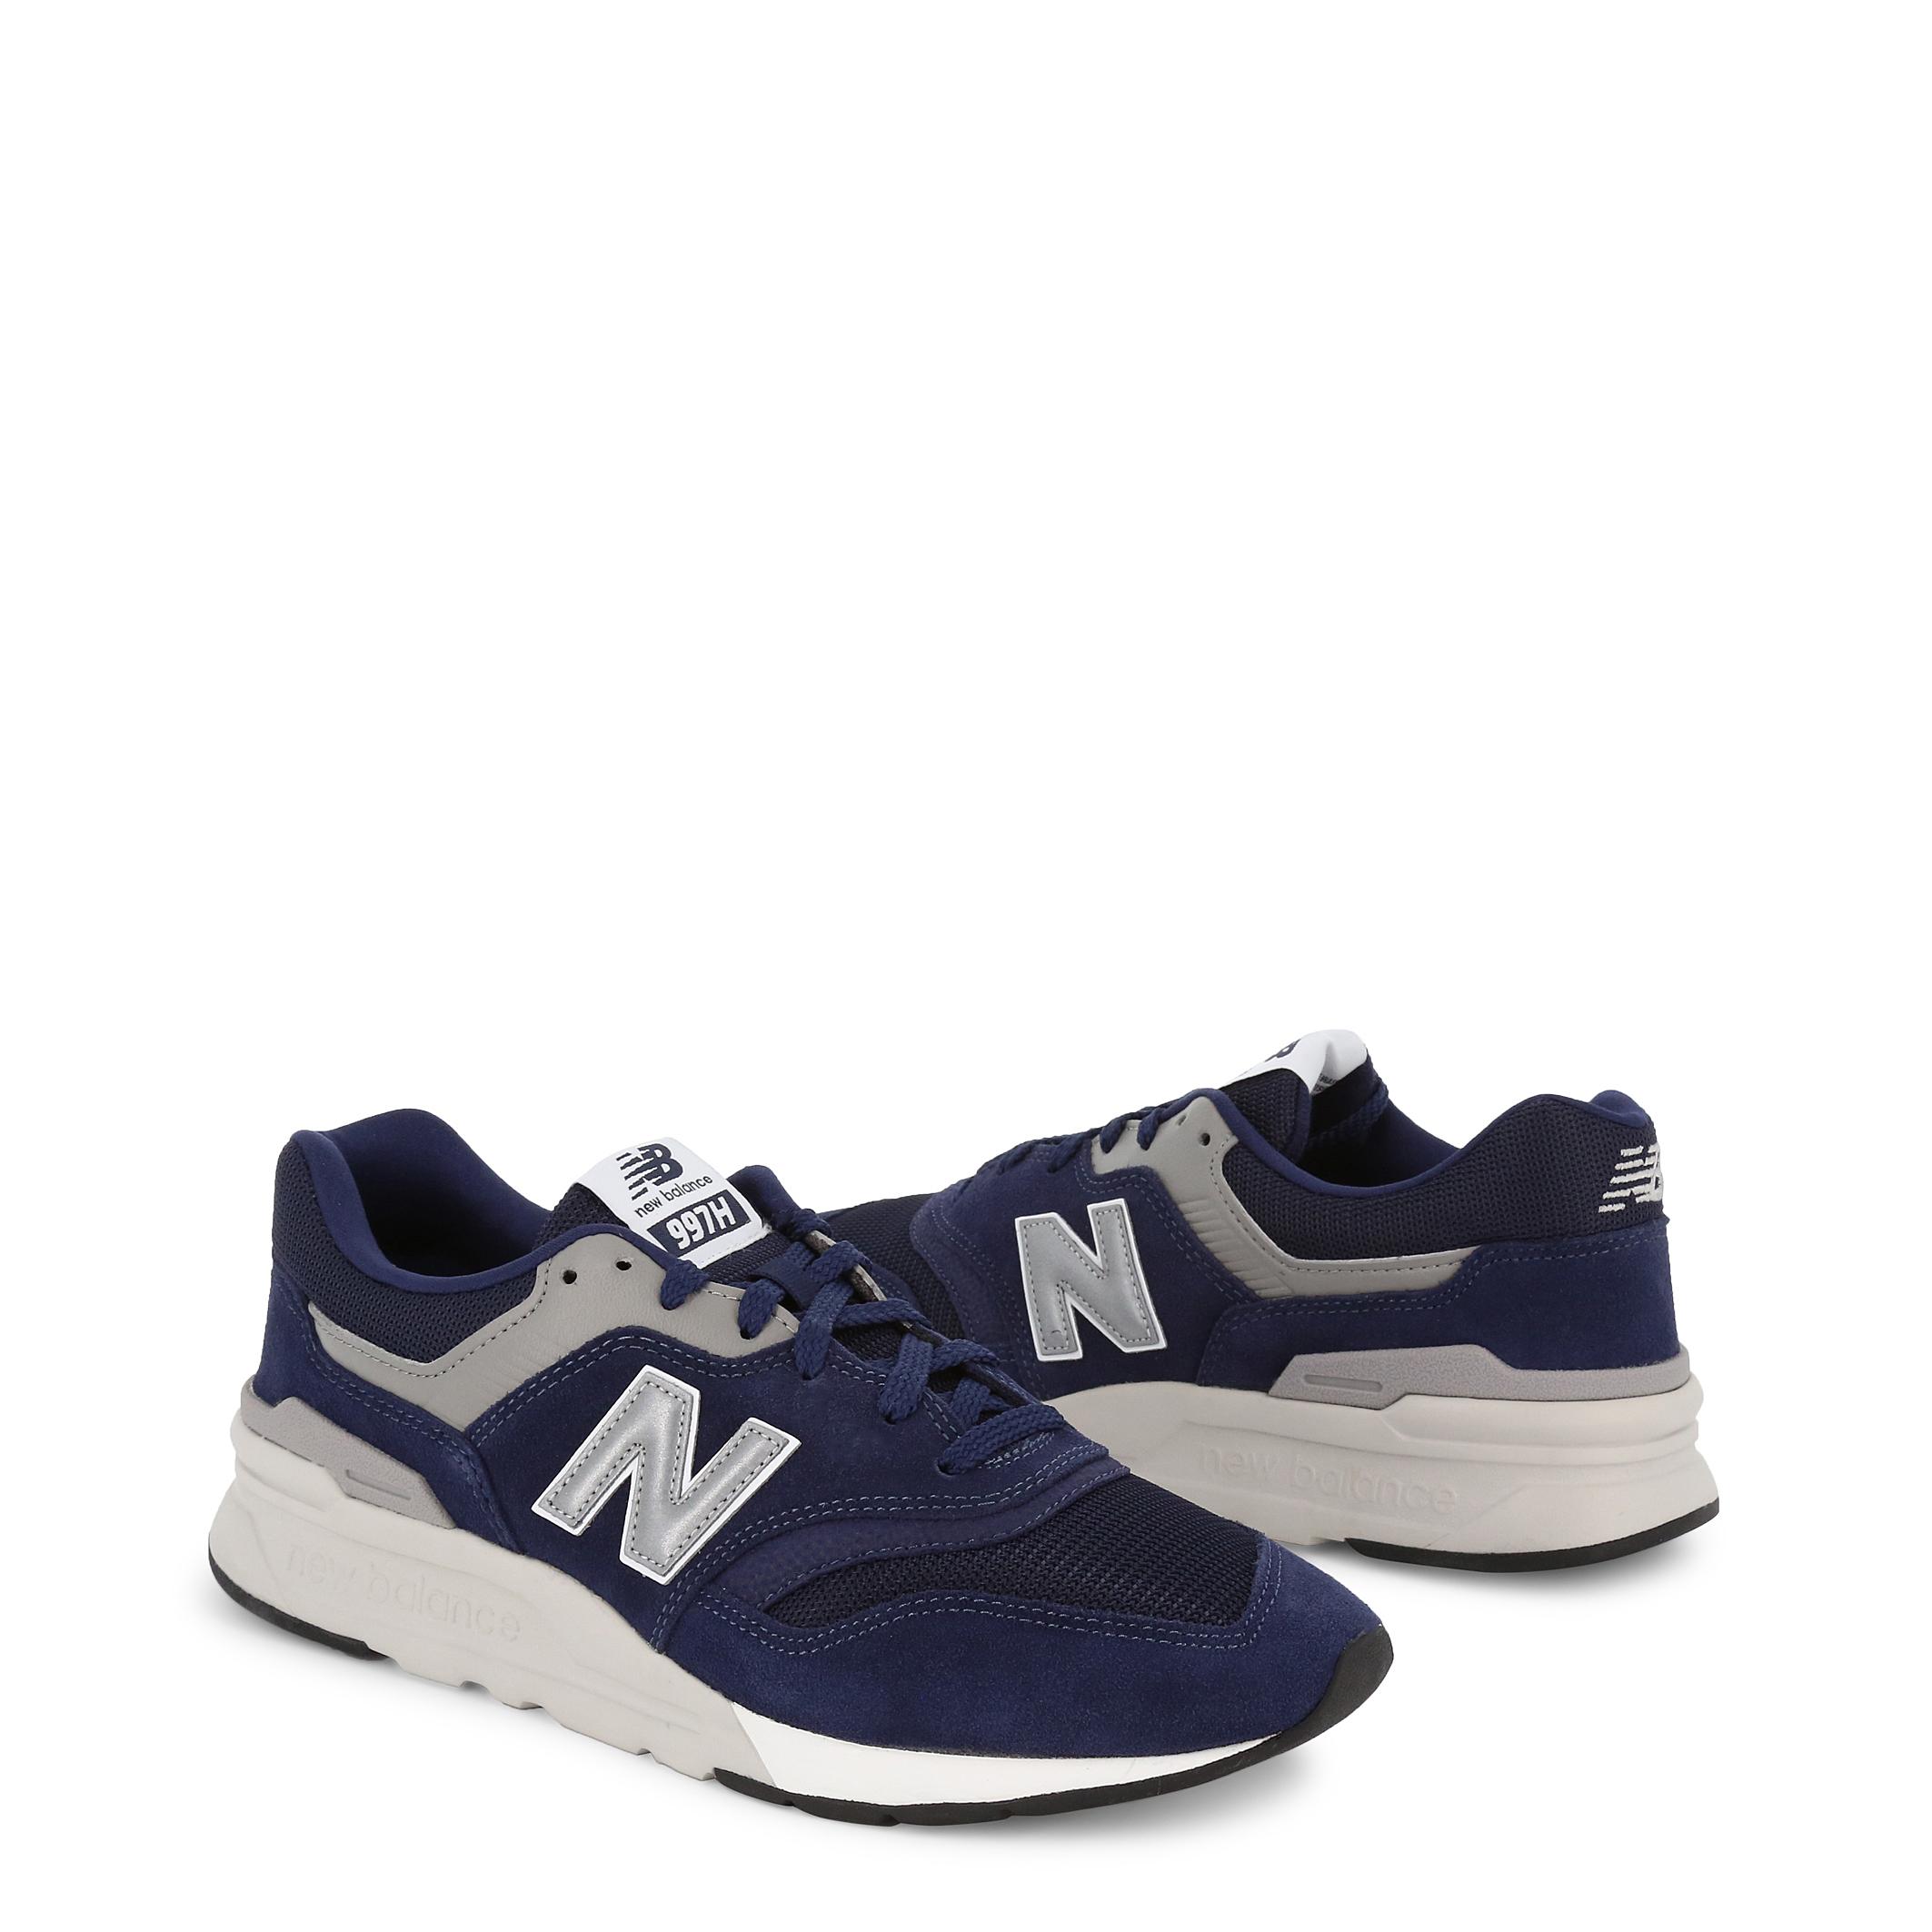 New-Balance-CM997-Men-Sneakers-Blue thumbnail 5